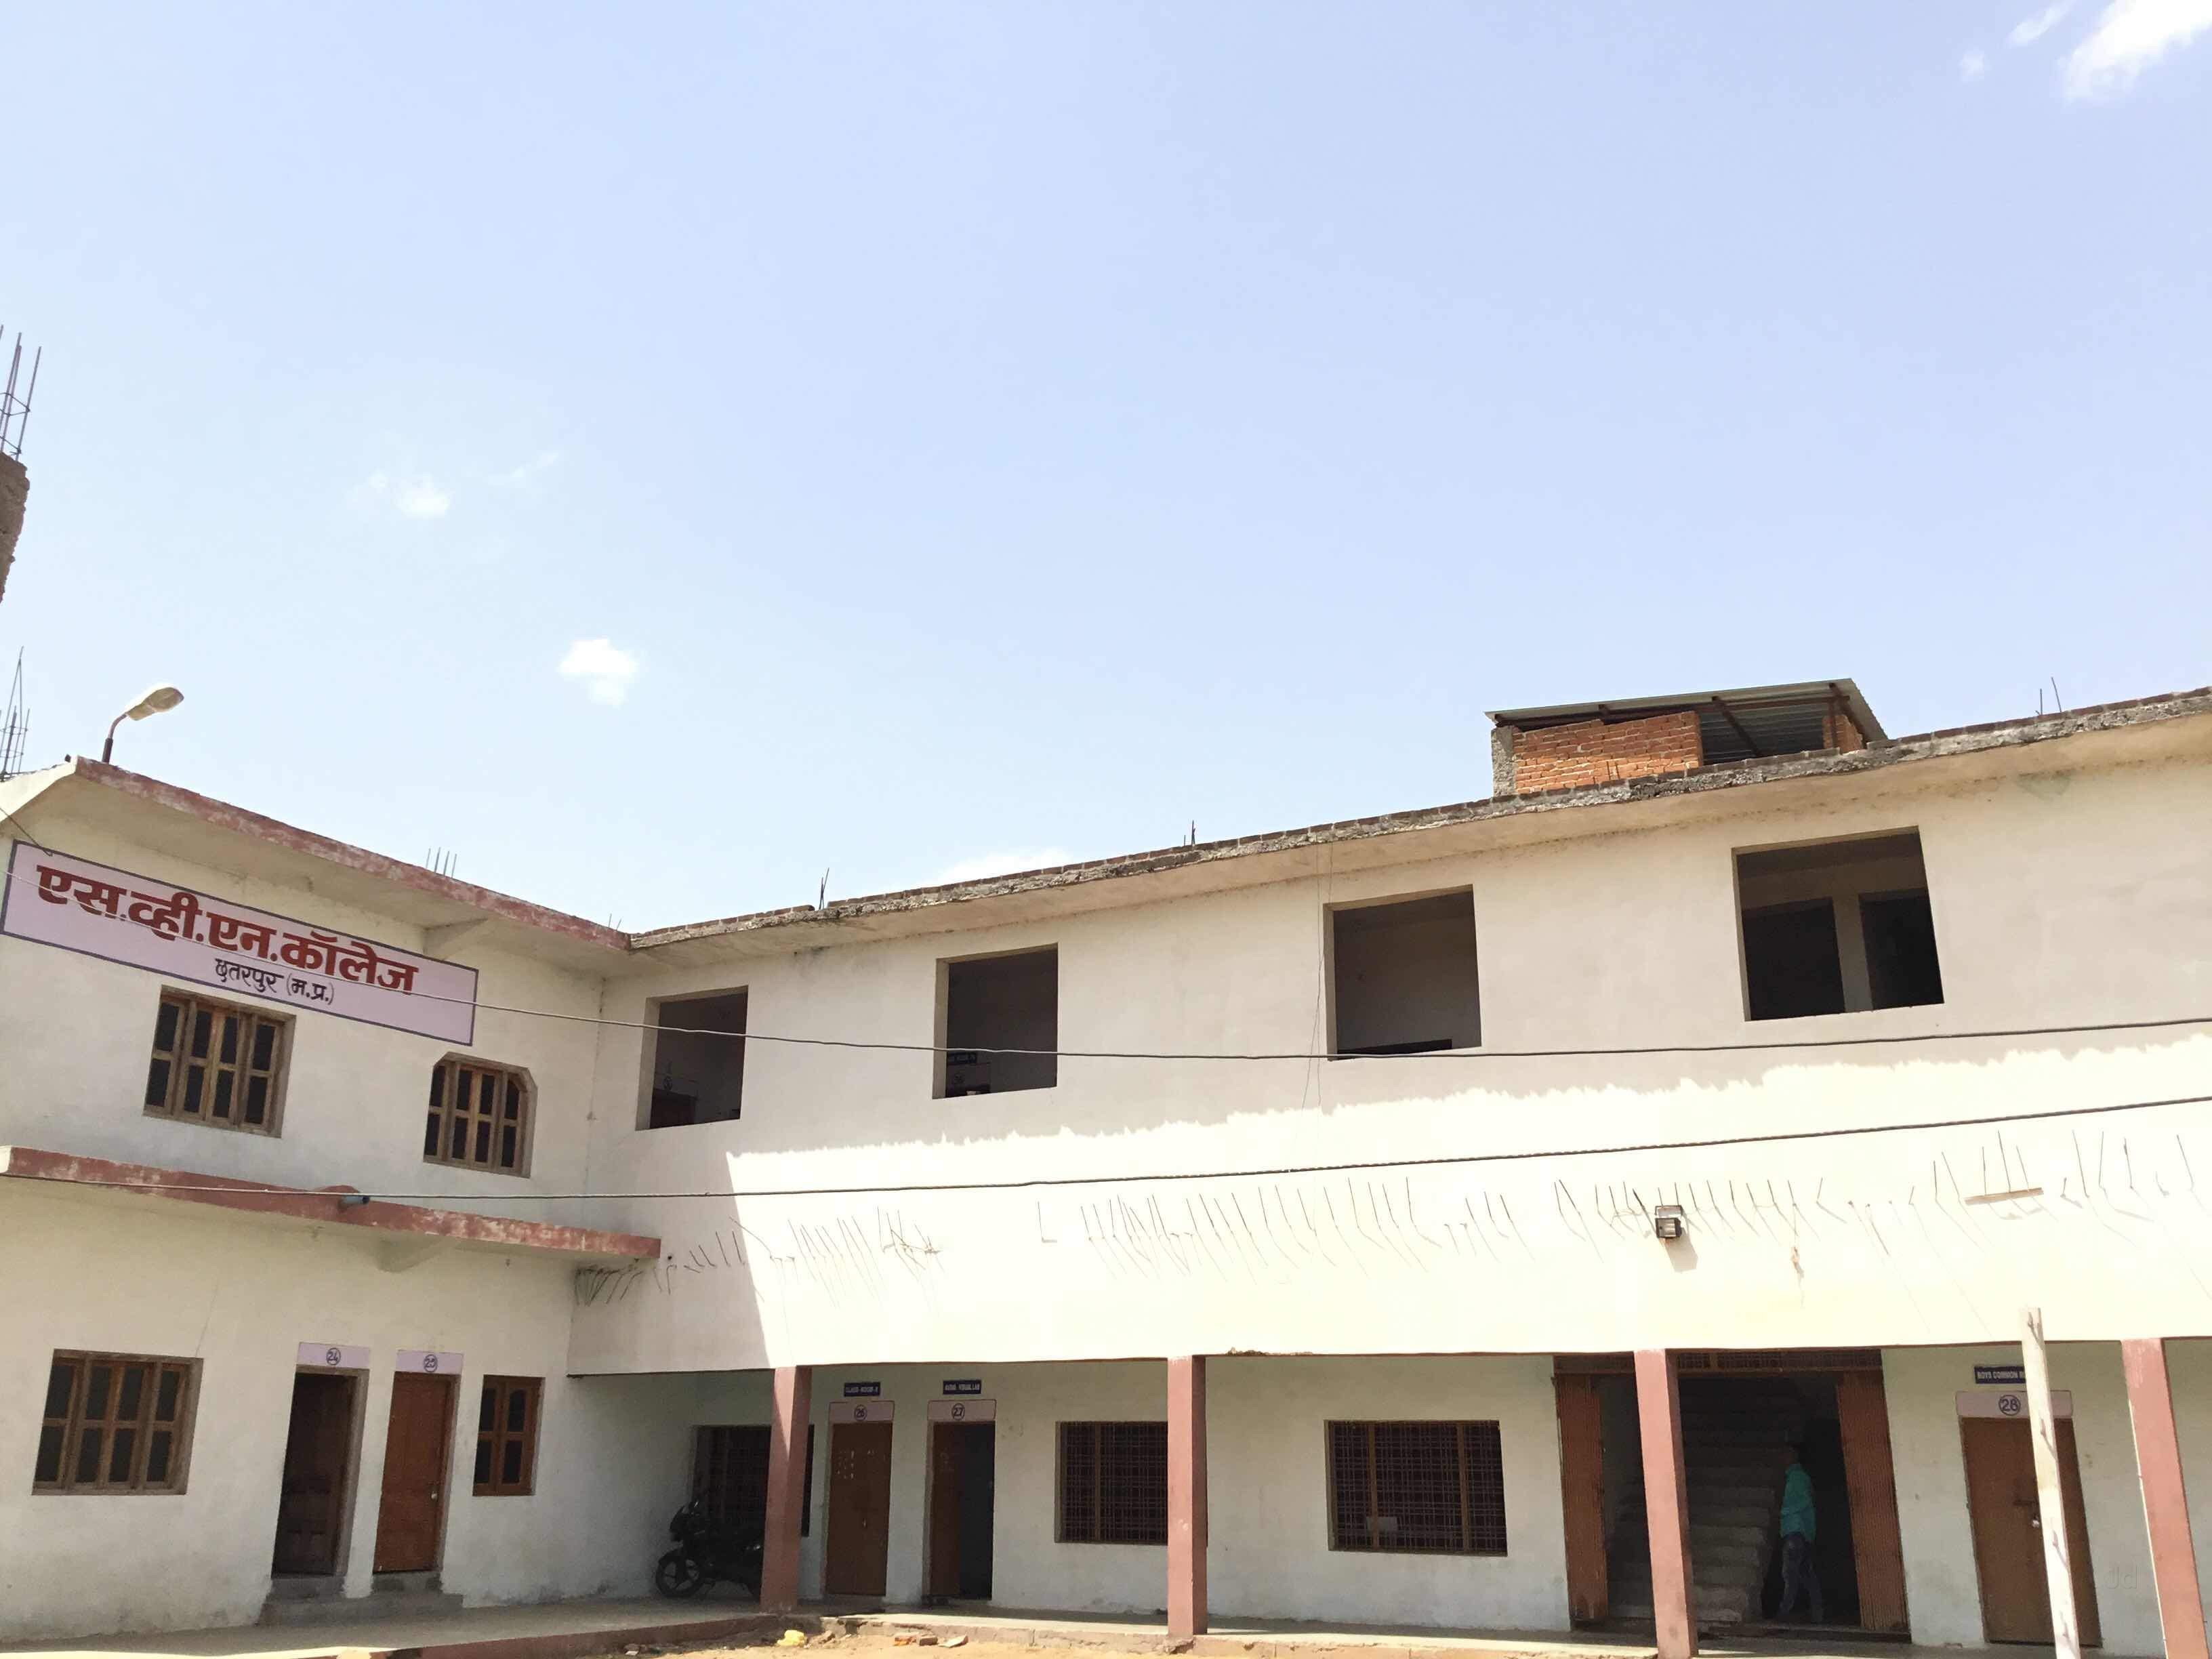 Swami Vivekanand Nursng College Image